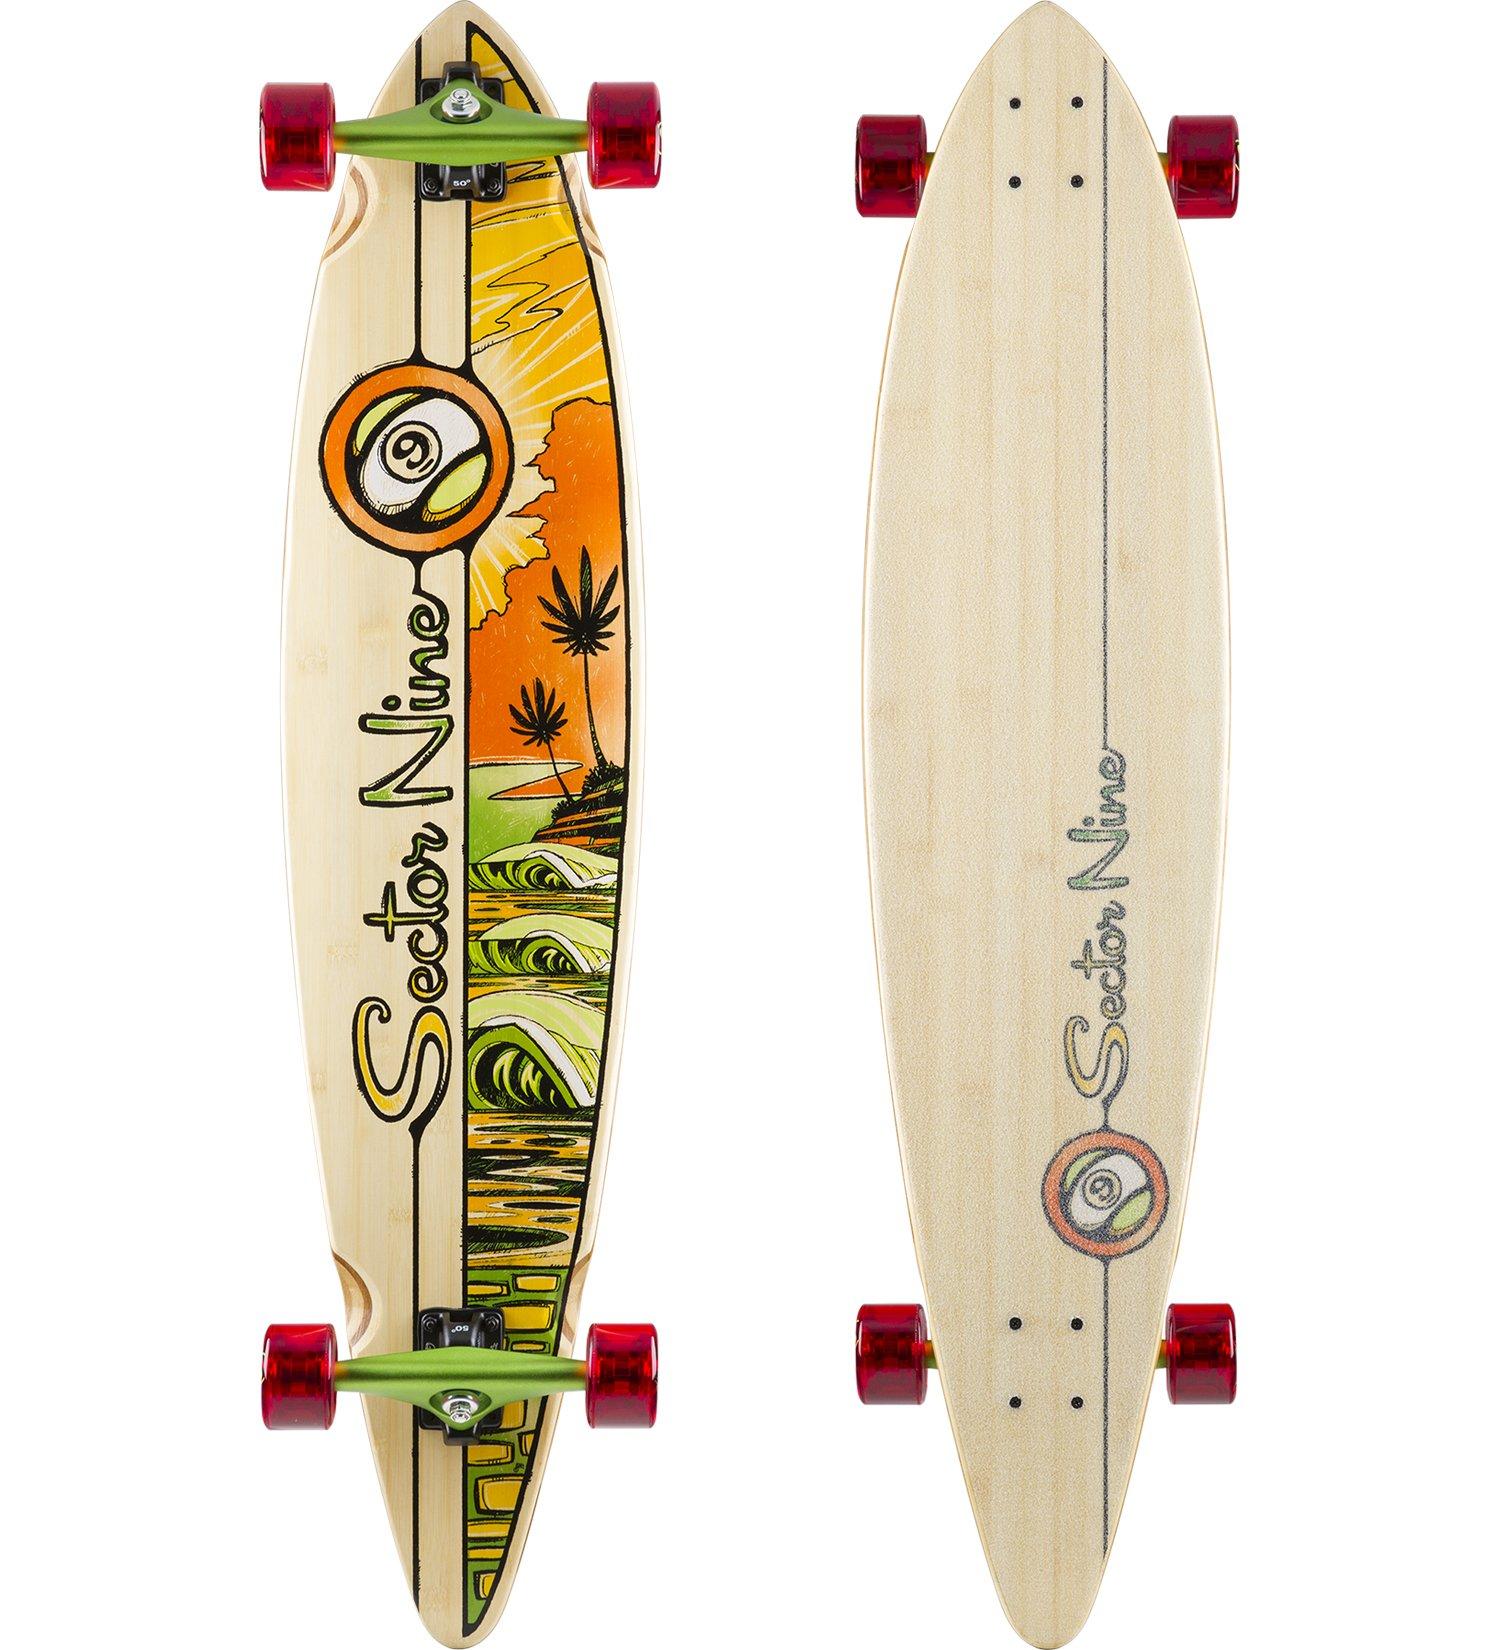 Sector 9 Sunburn 16 Complete Skateboard, Assorted, 44.0'' x 9.75'' WB - 30.4''